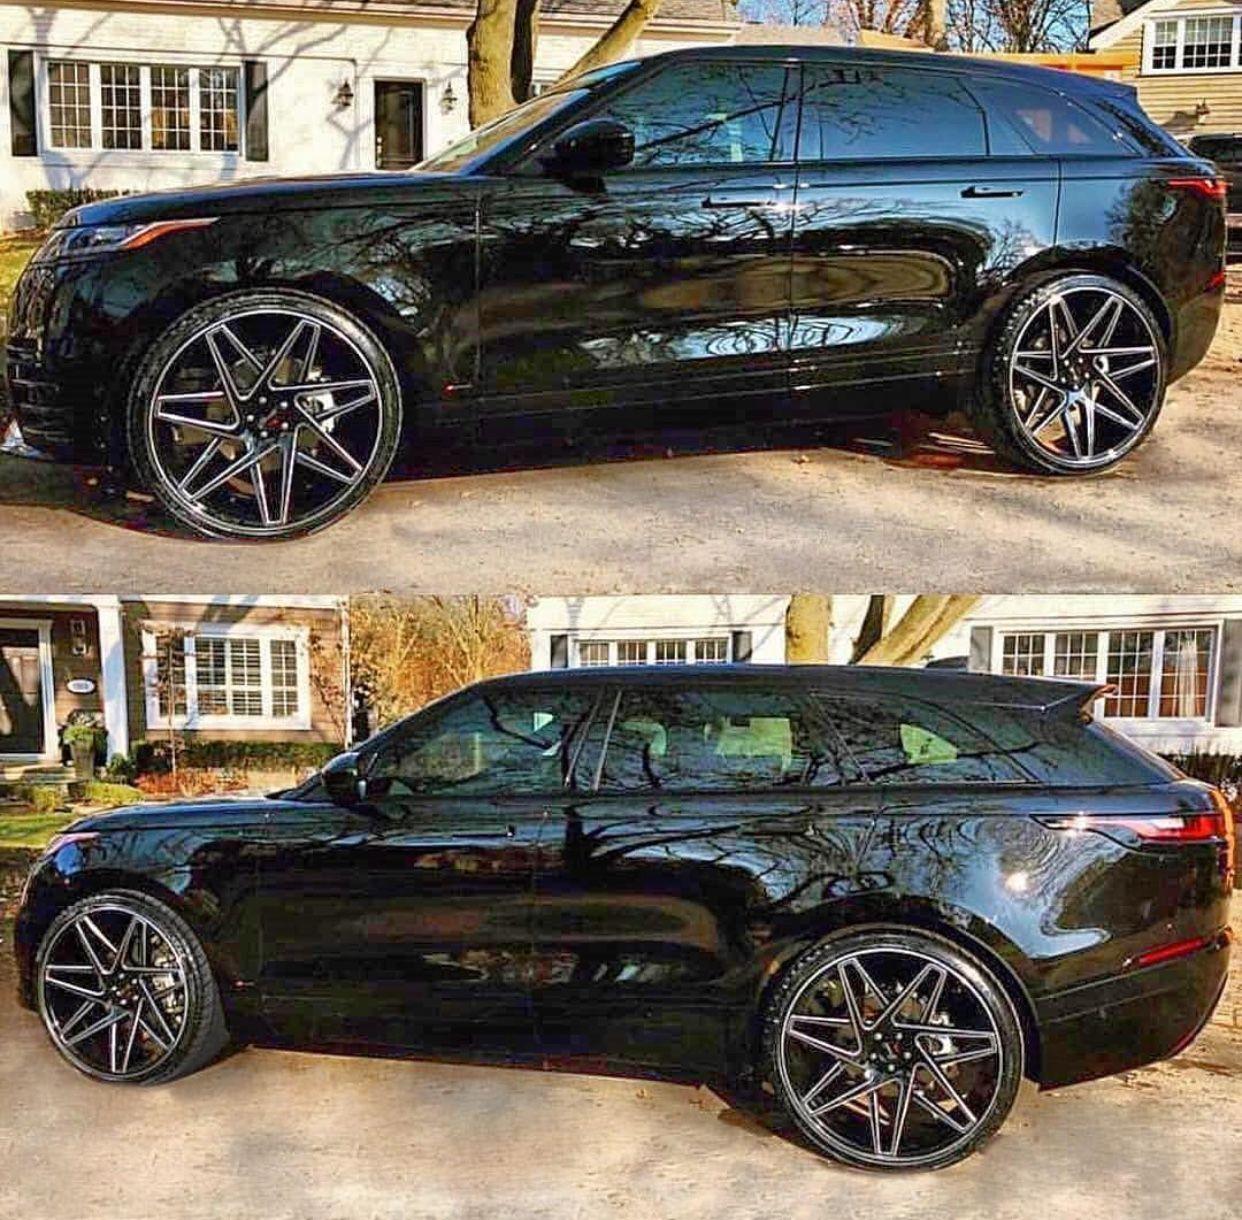 Ct Jaguar Dealers: RangeRover Velar